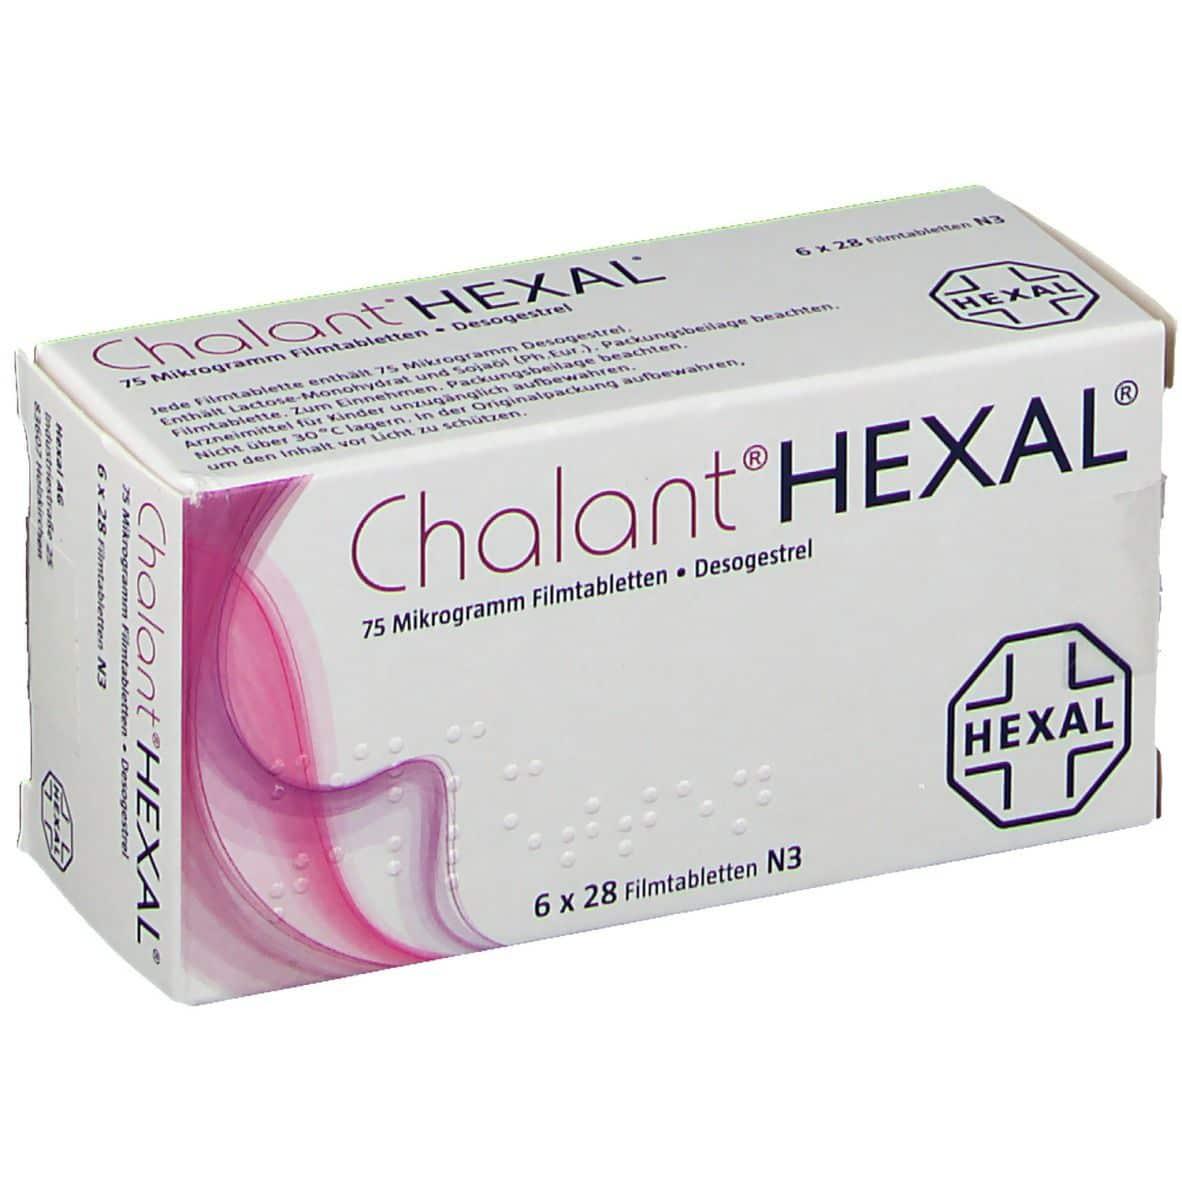 CHALANT HEXAL